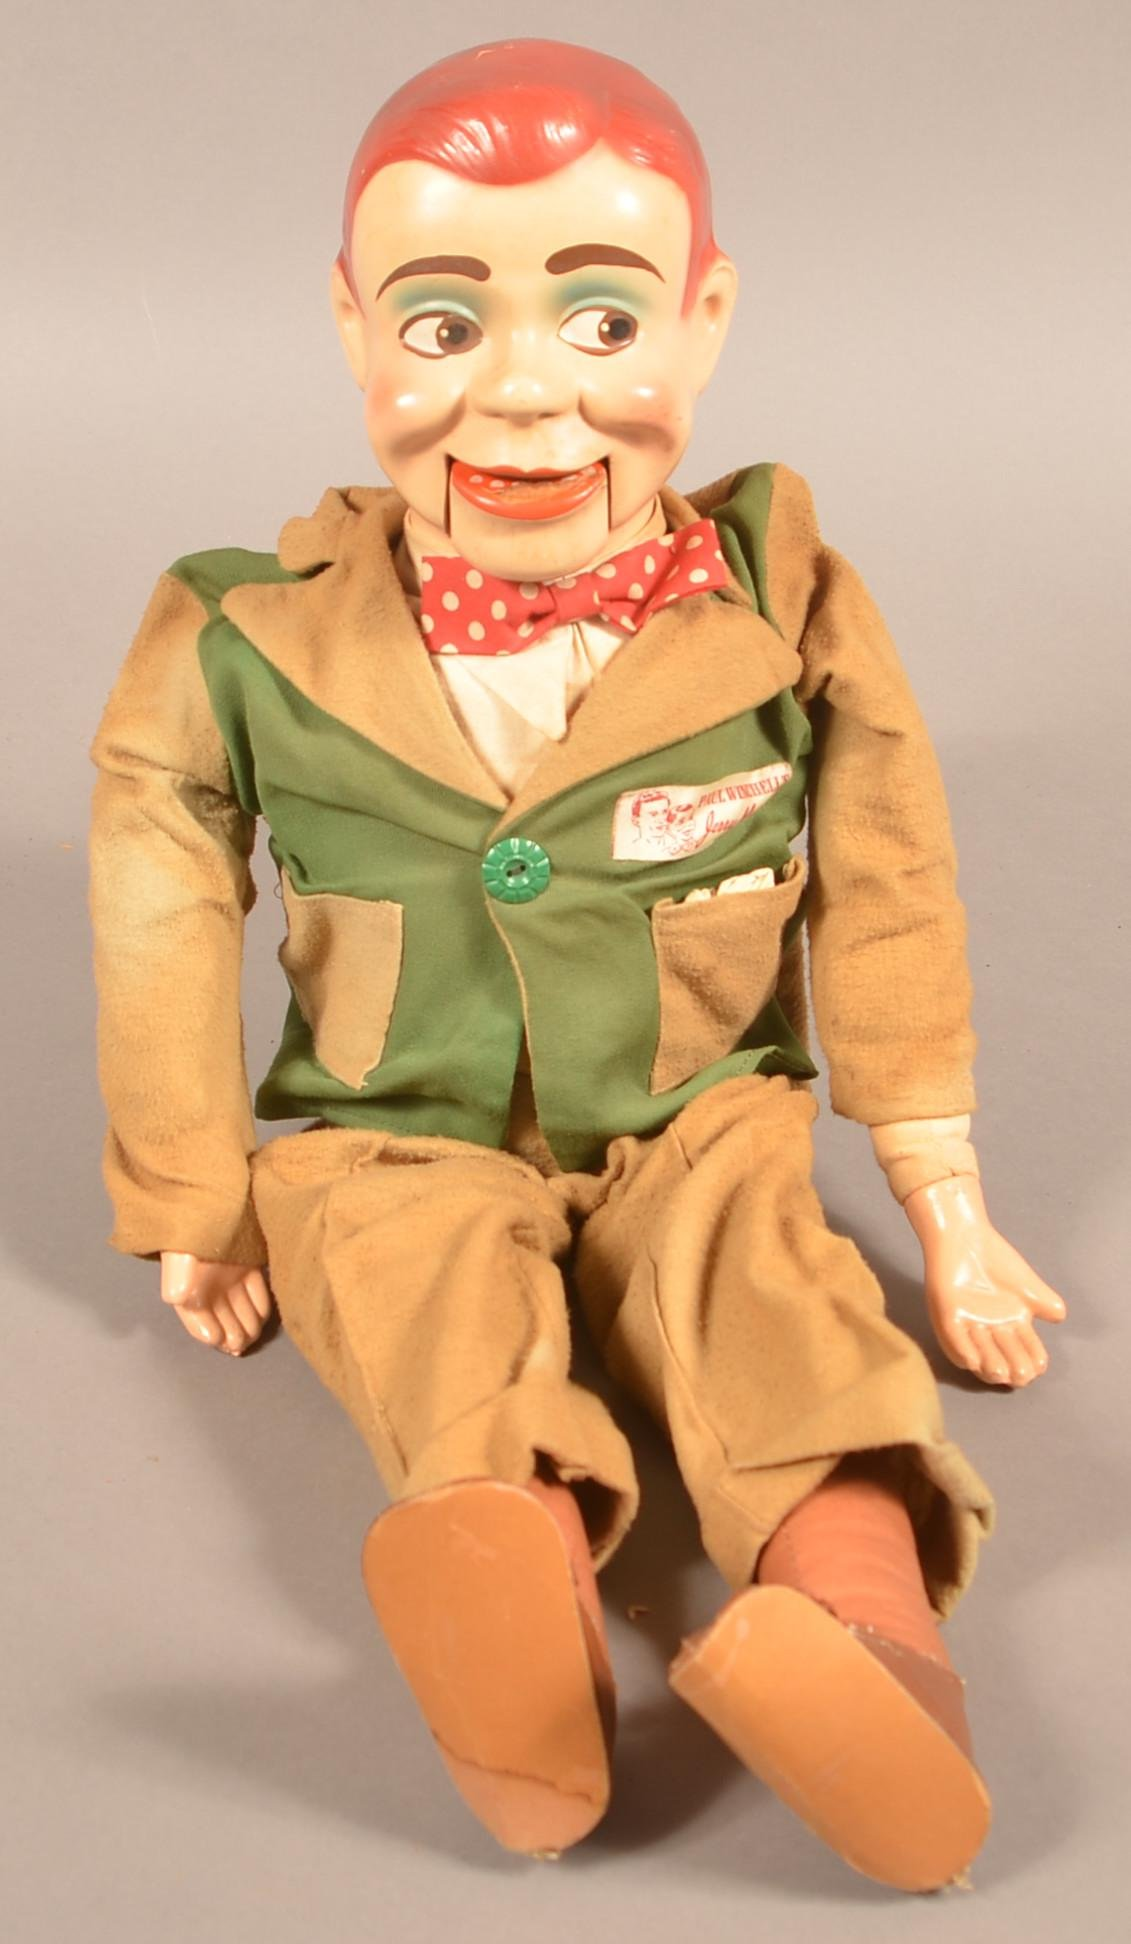 Vintage Jerry Mahoney Ventriloquist Doll.